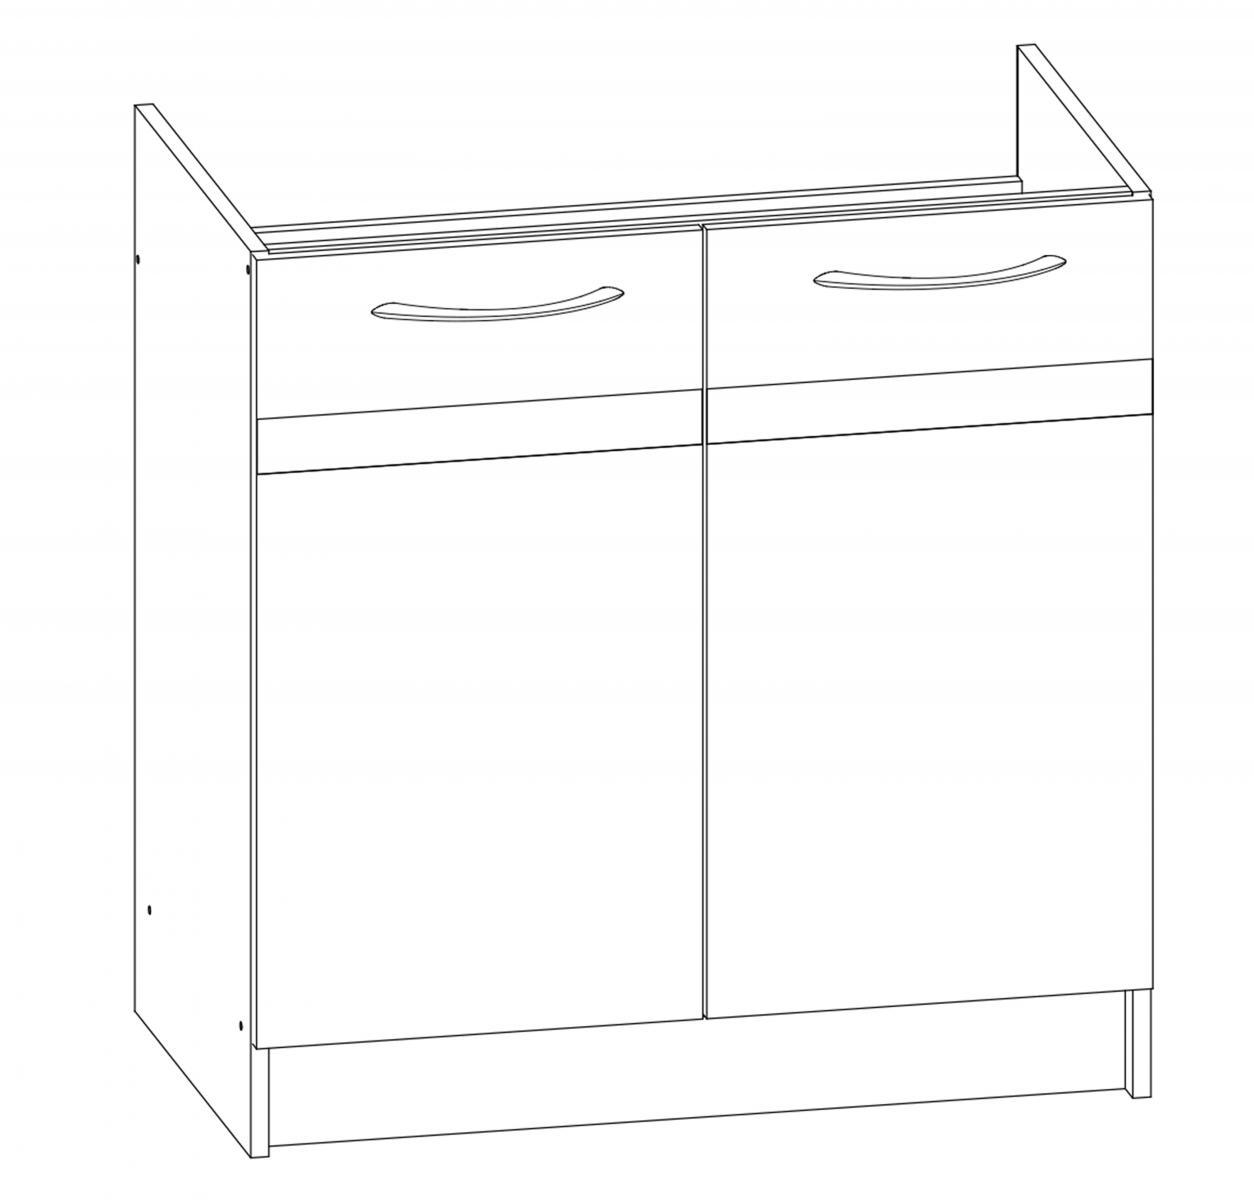 Kuchyňská skříňka Largo 09/D80Z sonoma tmavá